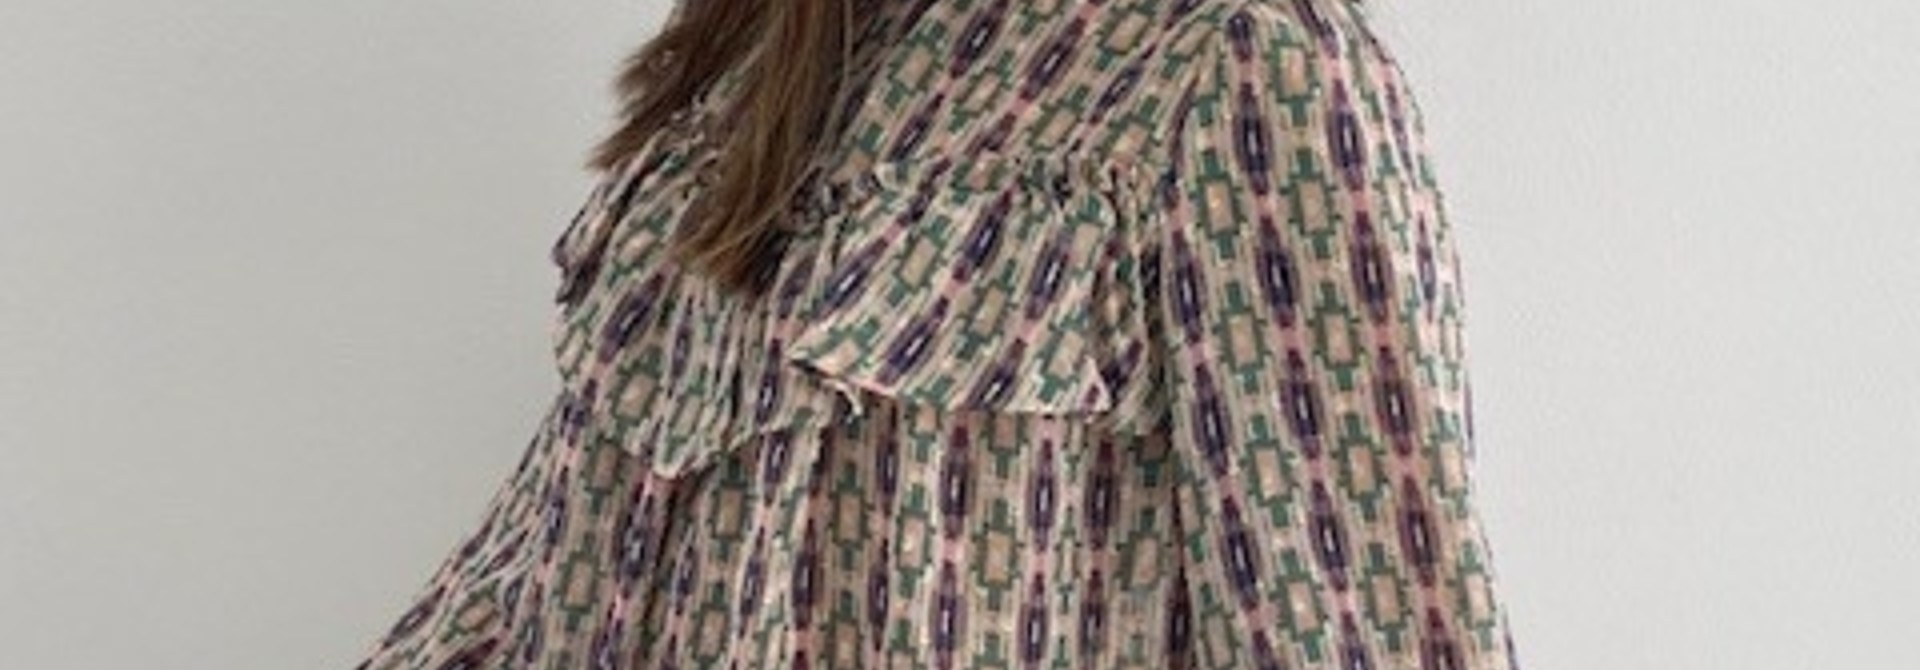 Ashley bohemain blouse Green